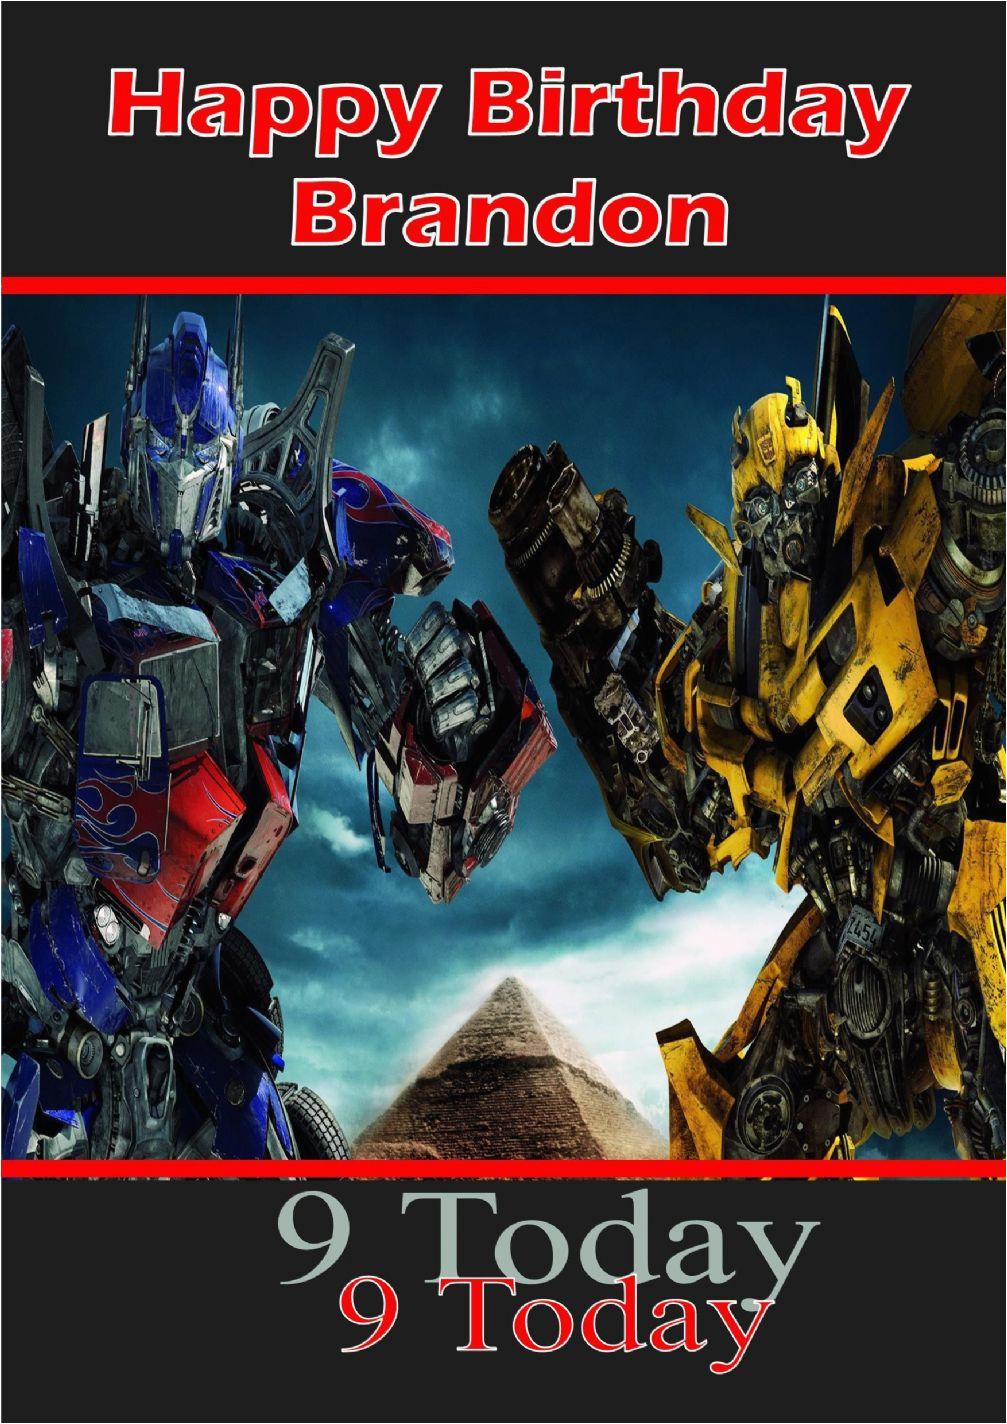 personalised transformers birthday card